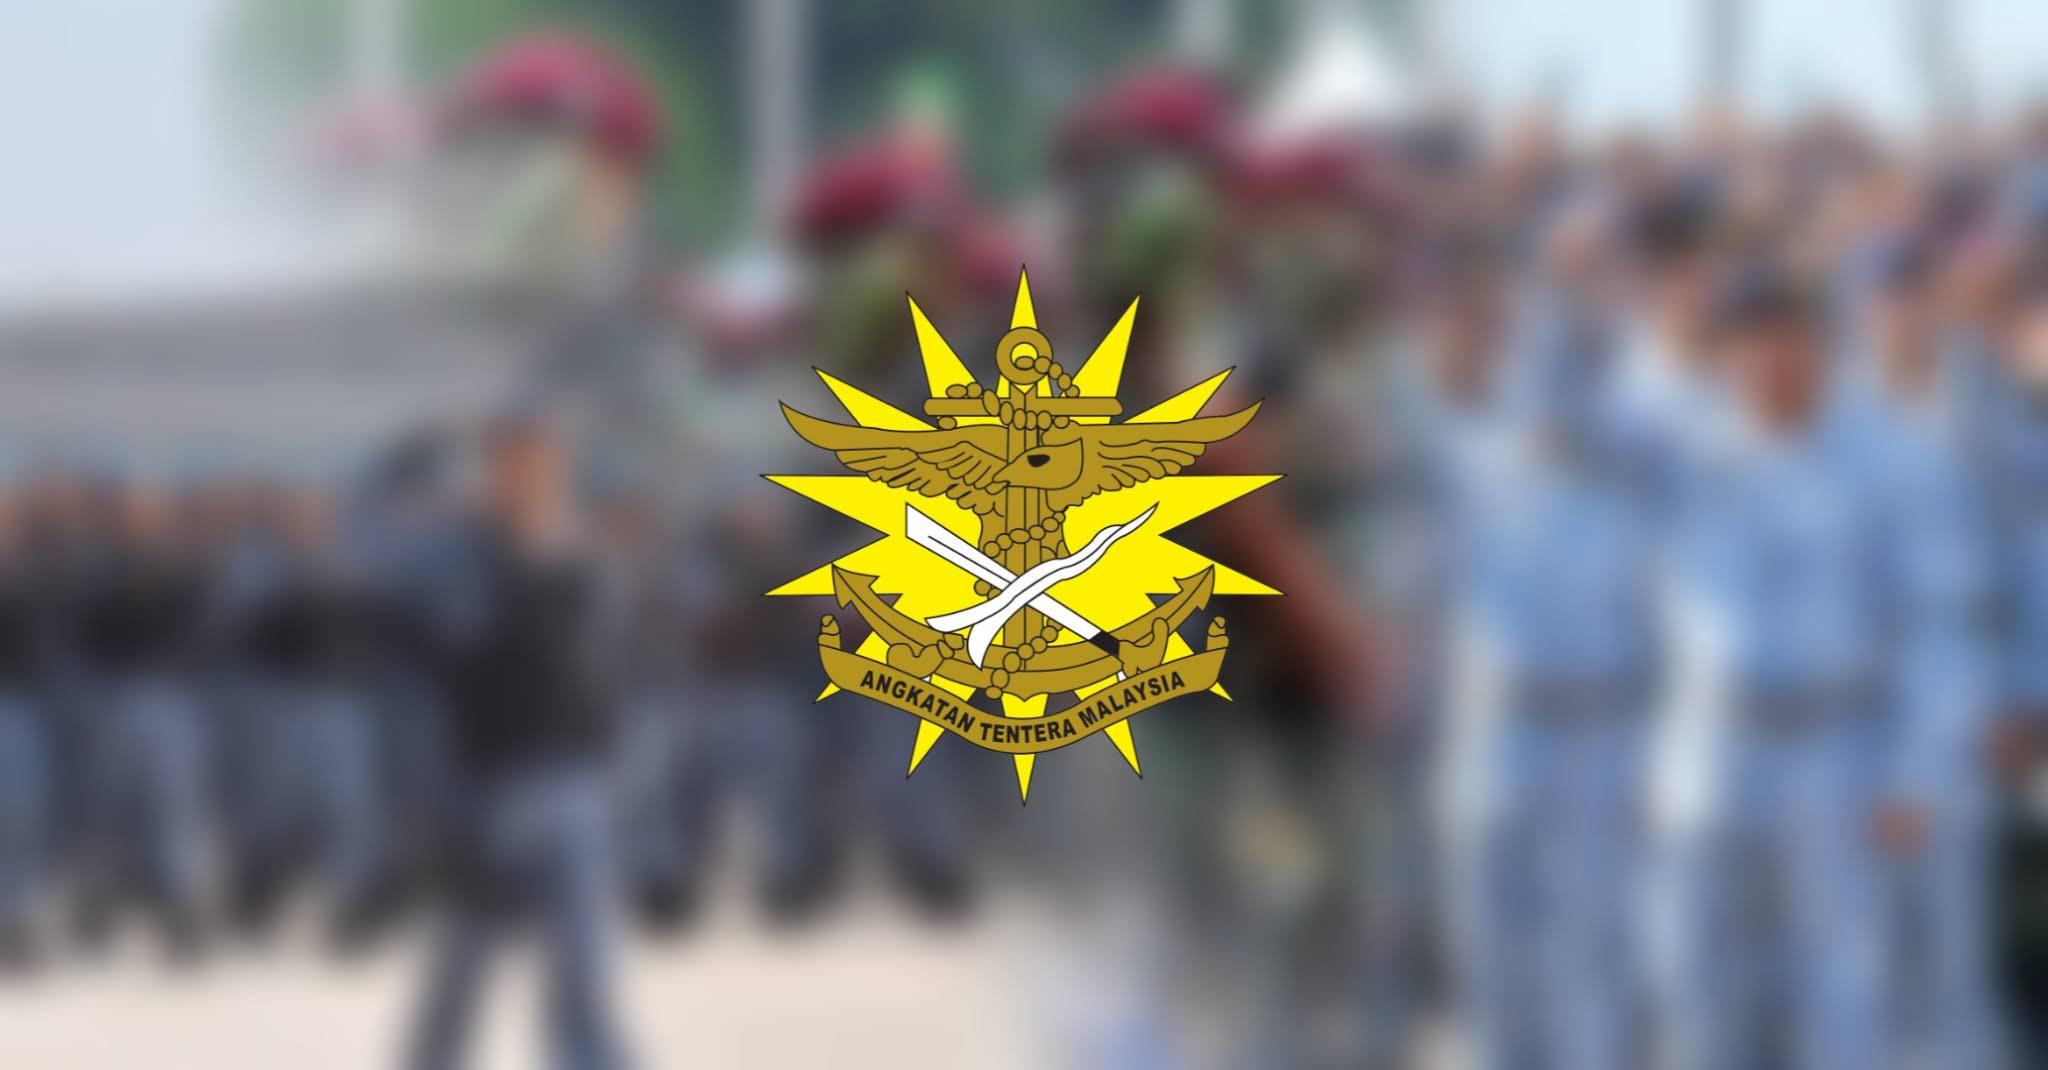 Permohonan Pegawai Kadet Graduan ATM 2021 Online (Semakan Status)